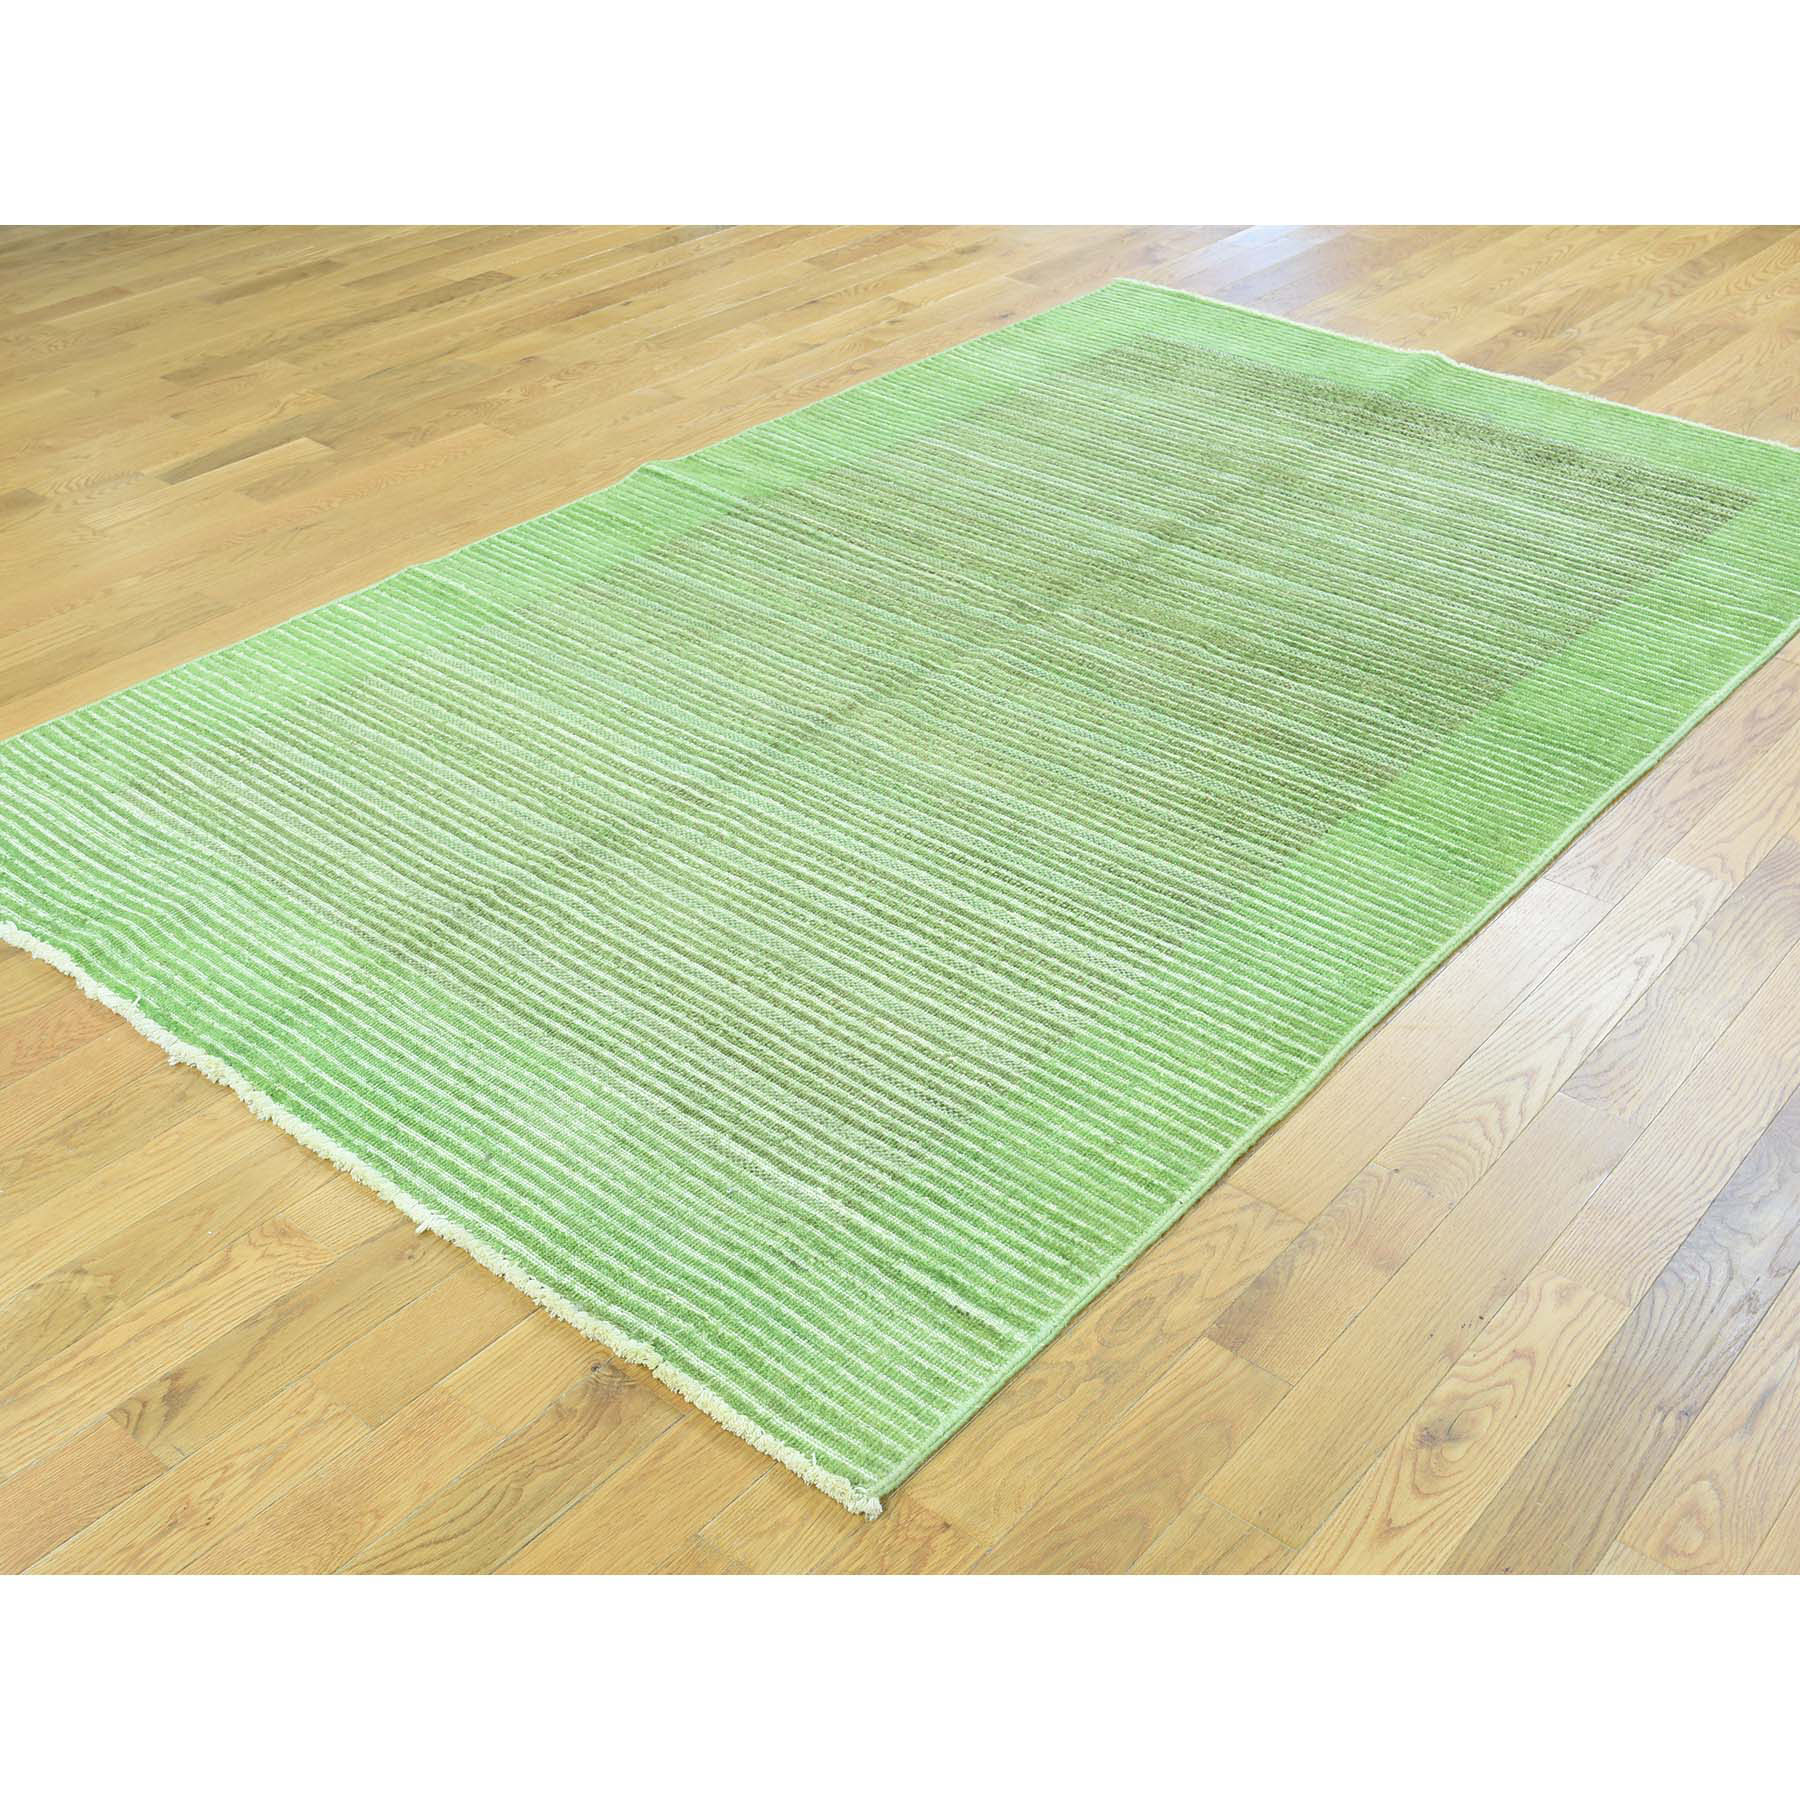 5-x8- Hand-Knotted 100 Percent Wool Gabbeh Overdyed Light Green Carpet